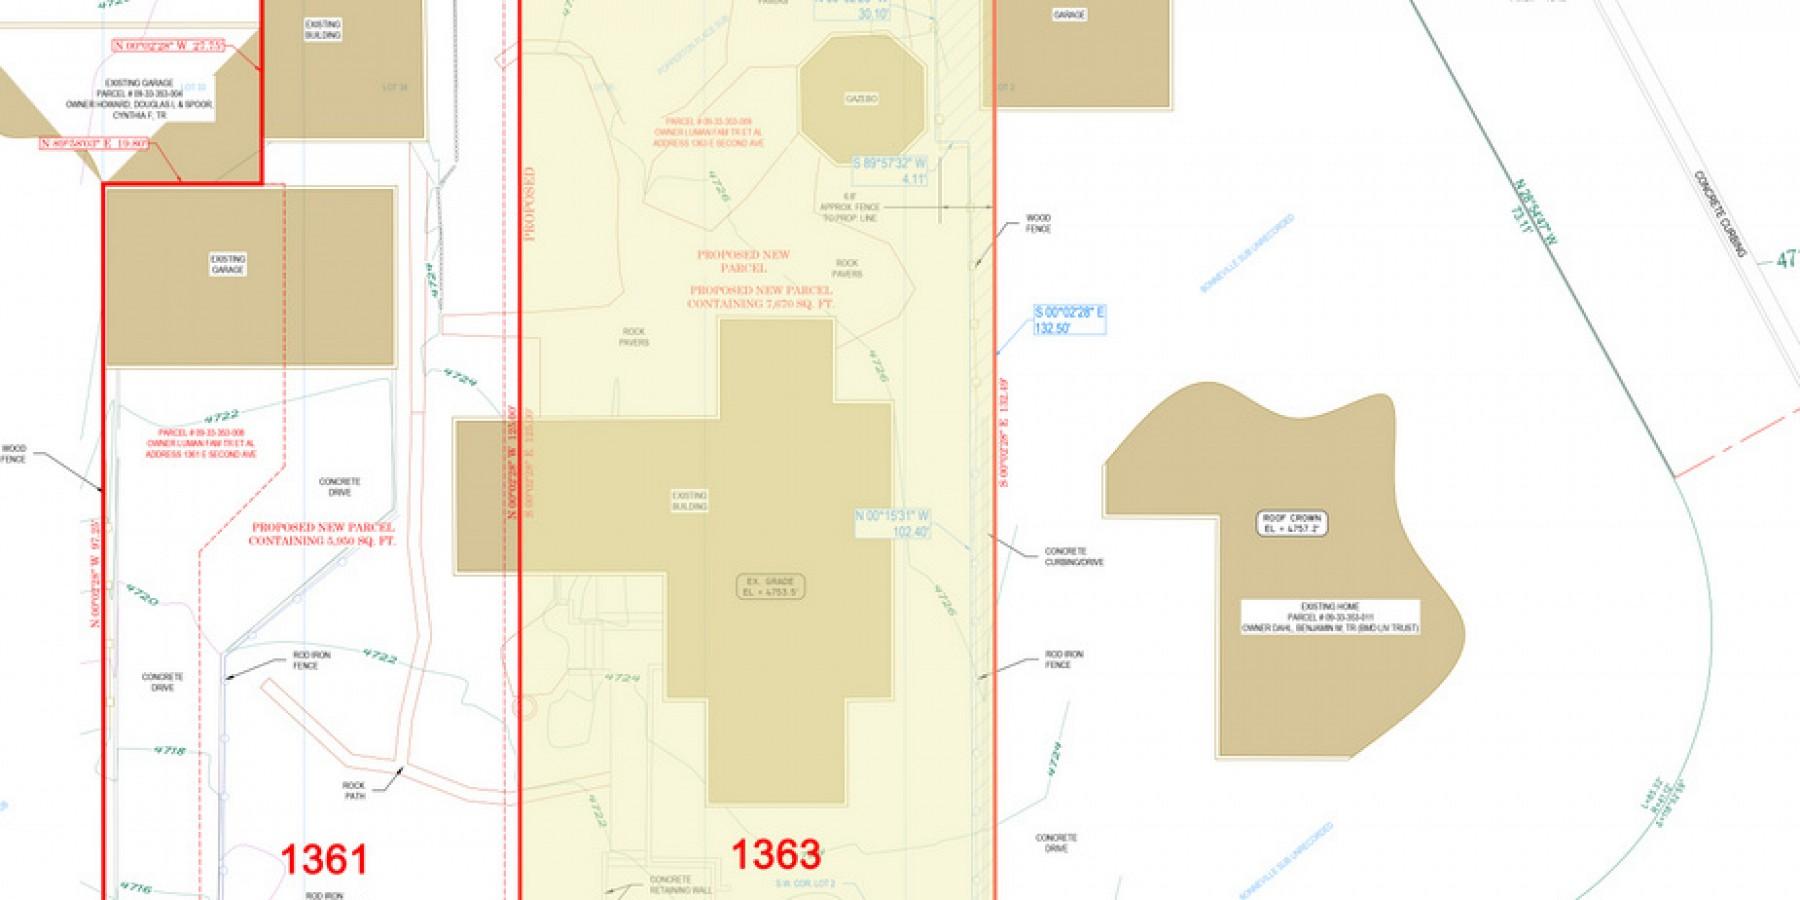 1363 E. Second Avenue, Salt Lake City, UT 84103